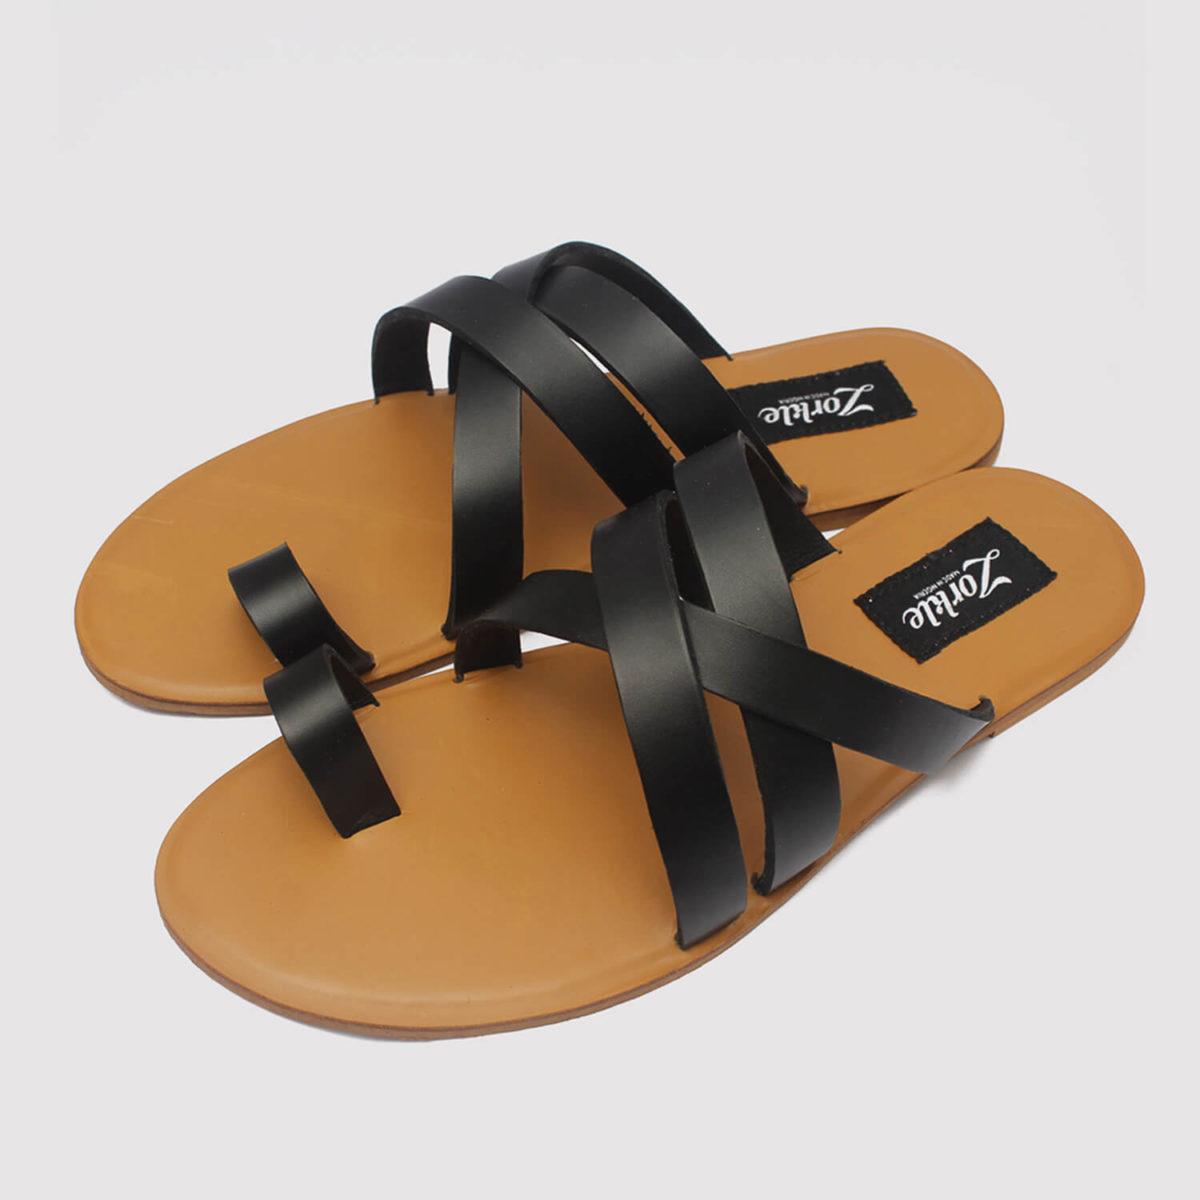 antler black leather zorkle shoes in lagos nigeria